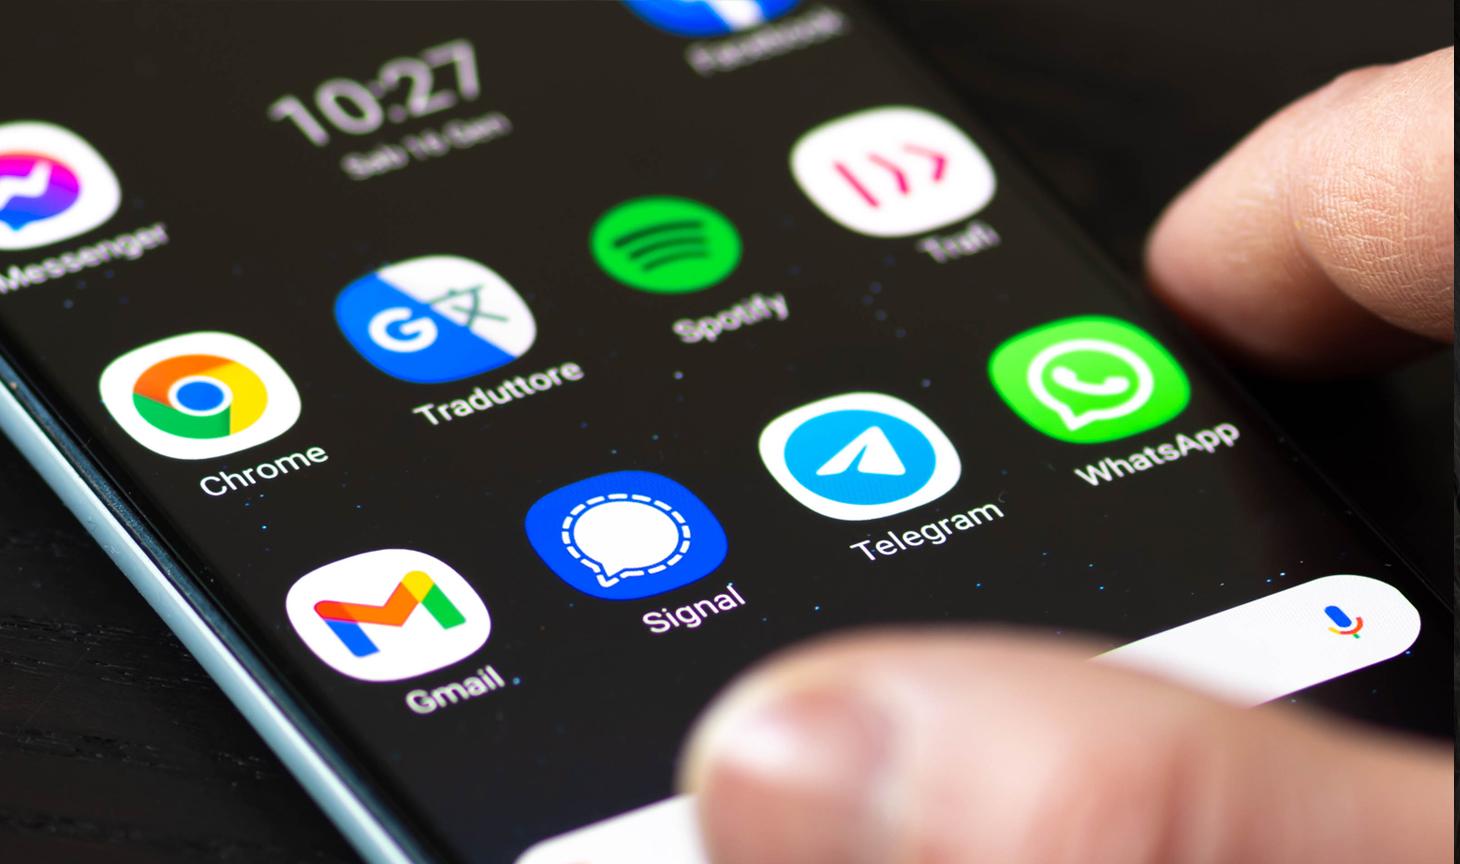 App - WhatsApp